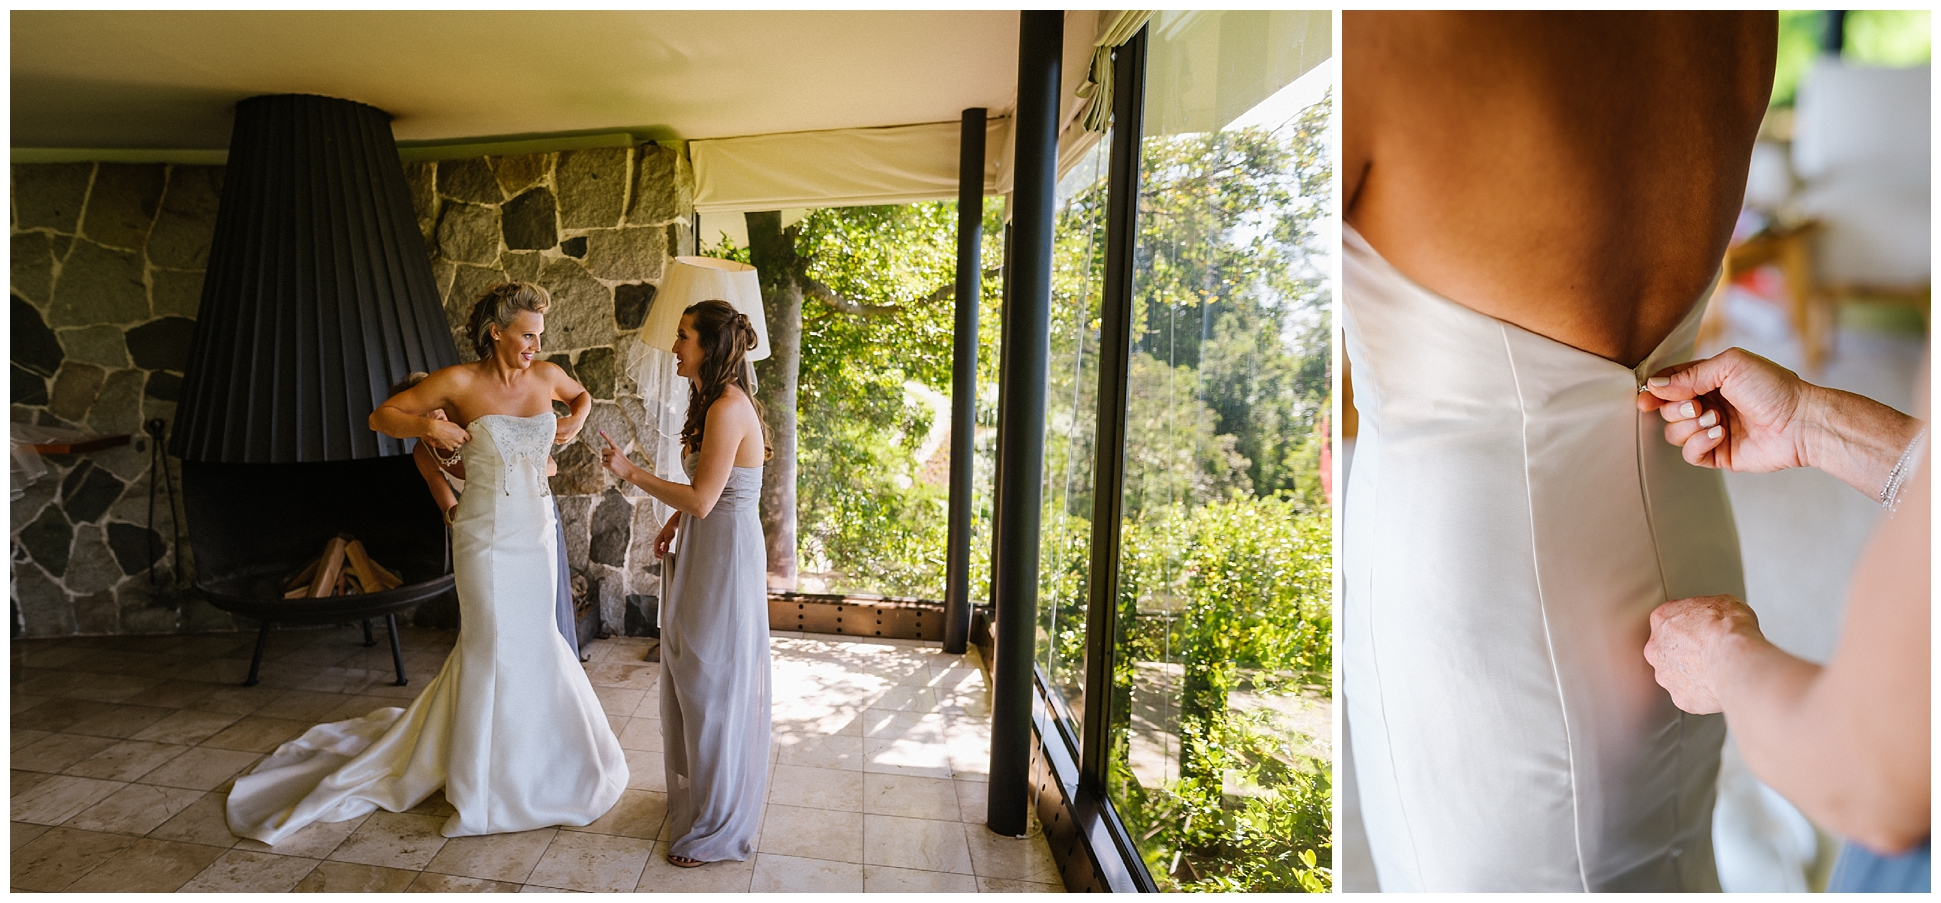 Cheilean-destination-adventure-wedding-florida-patagonia-pucon-santa-cruz-vsco_0081.jpg